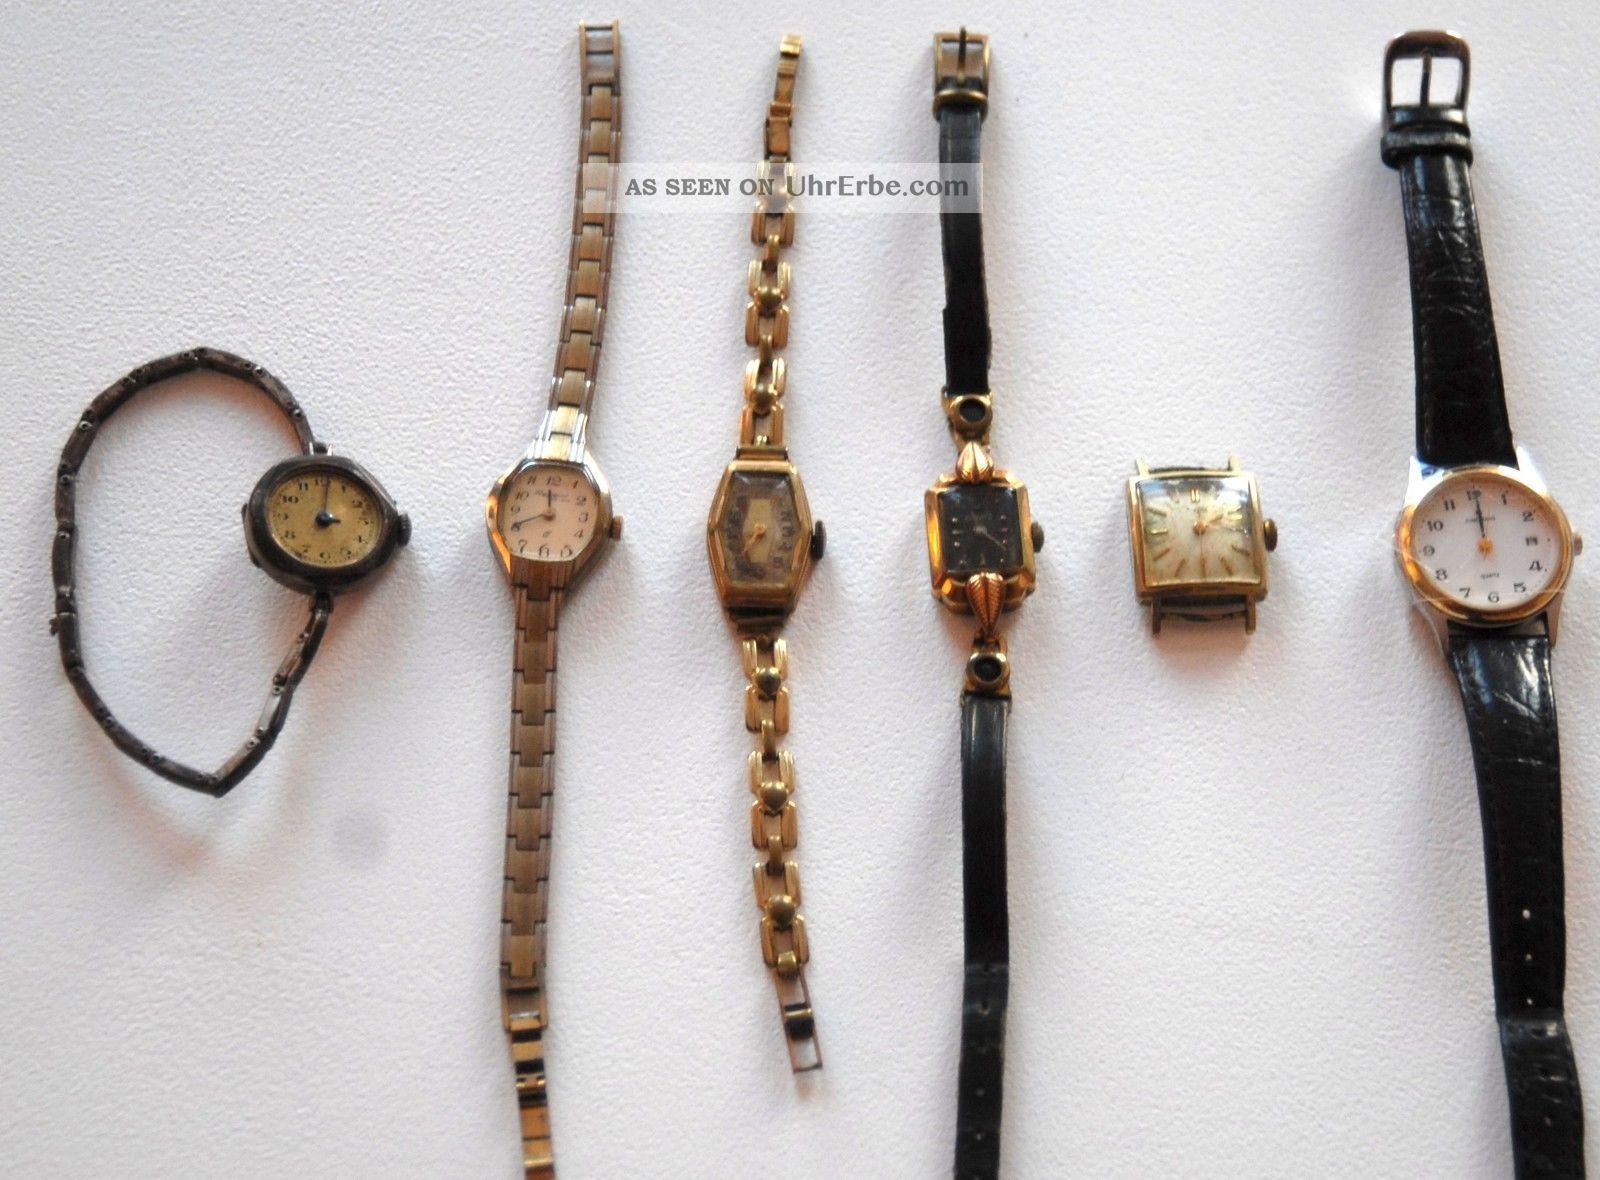 Konvolut 6 Uhren Armbanduhren An Bastler Ca.  40 - 100 Jahre,  Junghans,  Provita Armbanduhren Bild